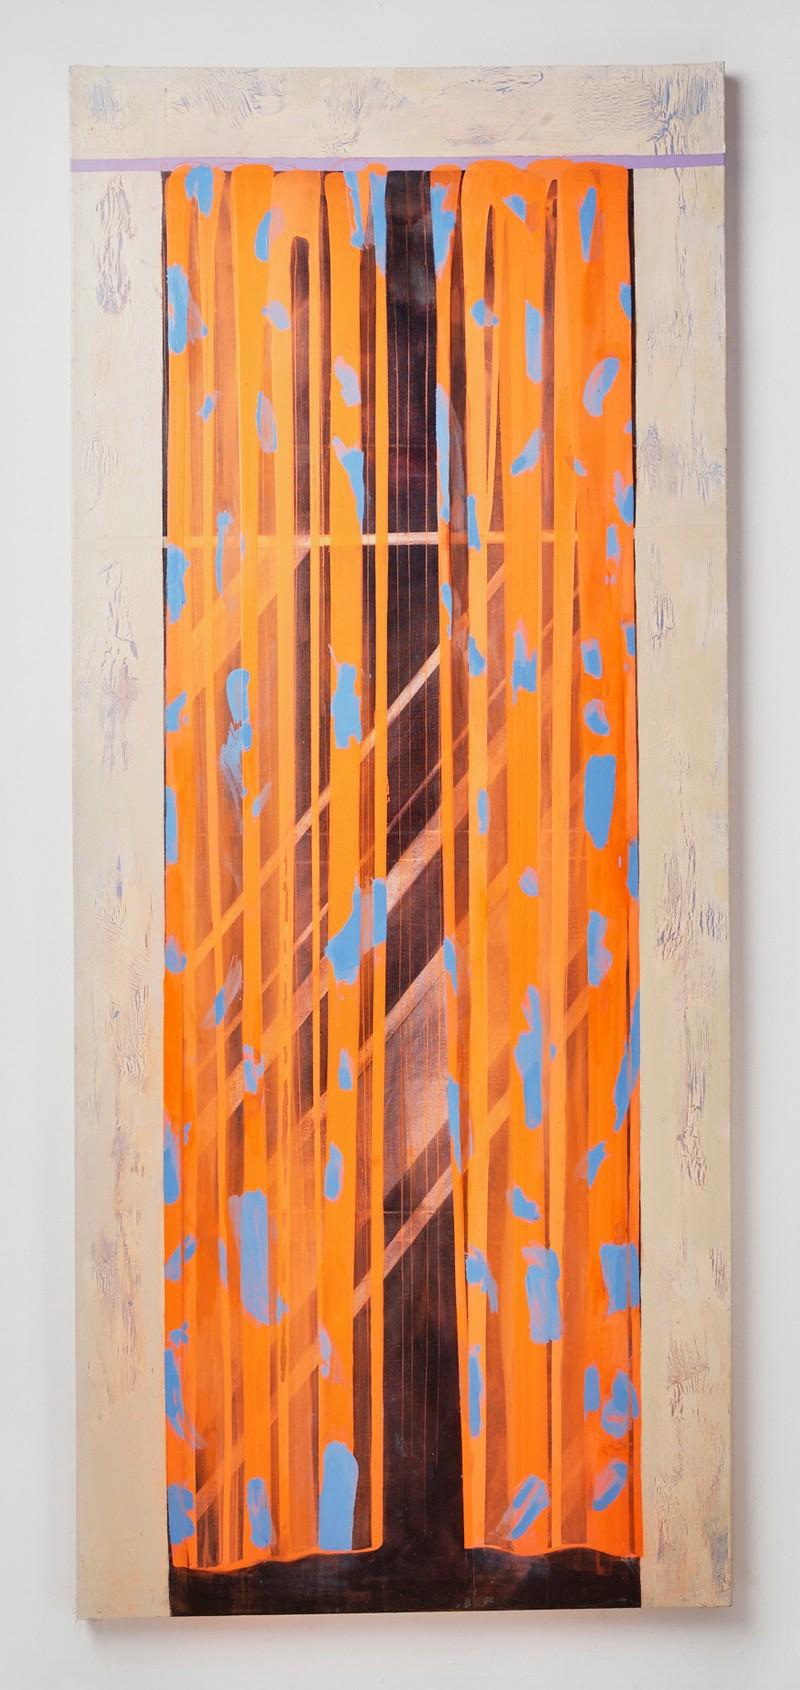 Artwork – Accurate Reflection #4 (Lynda), 2017